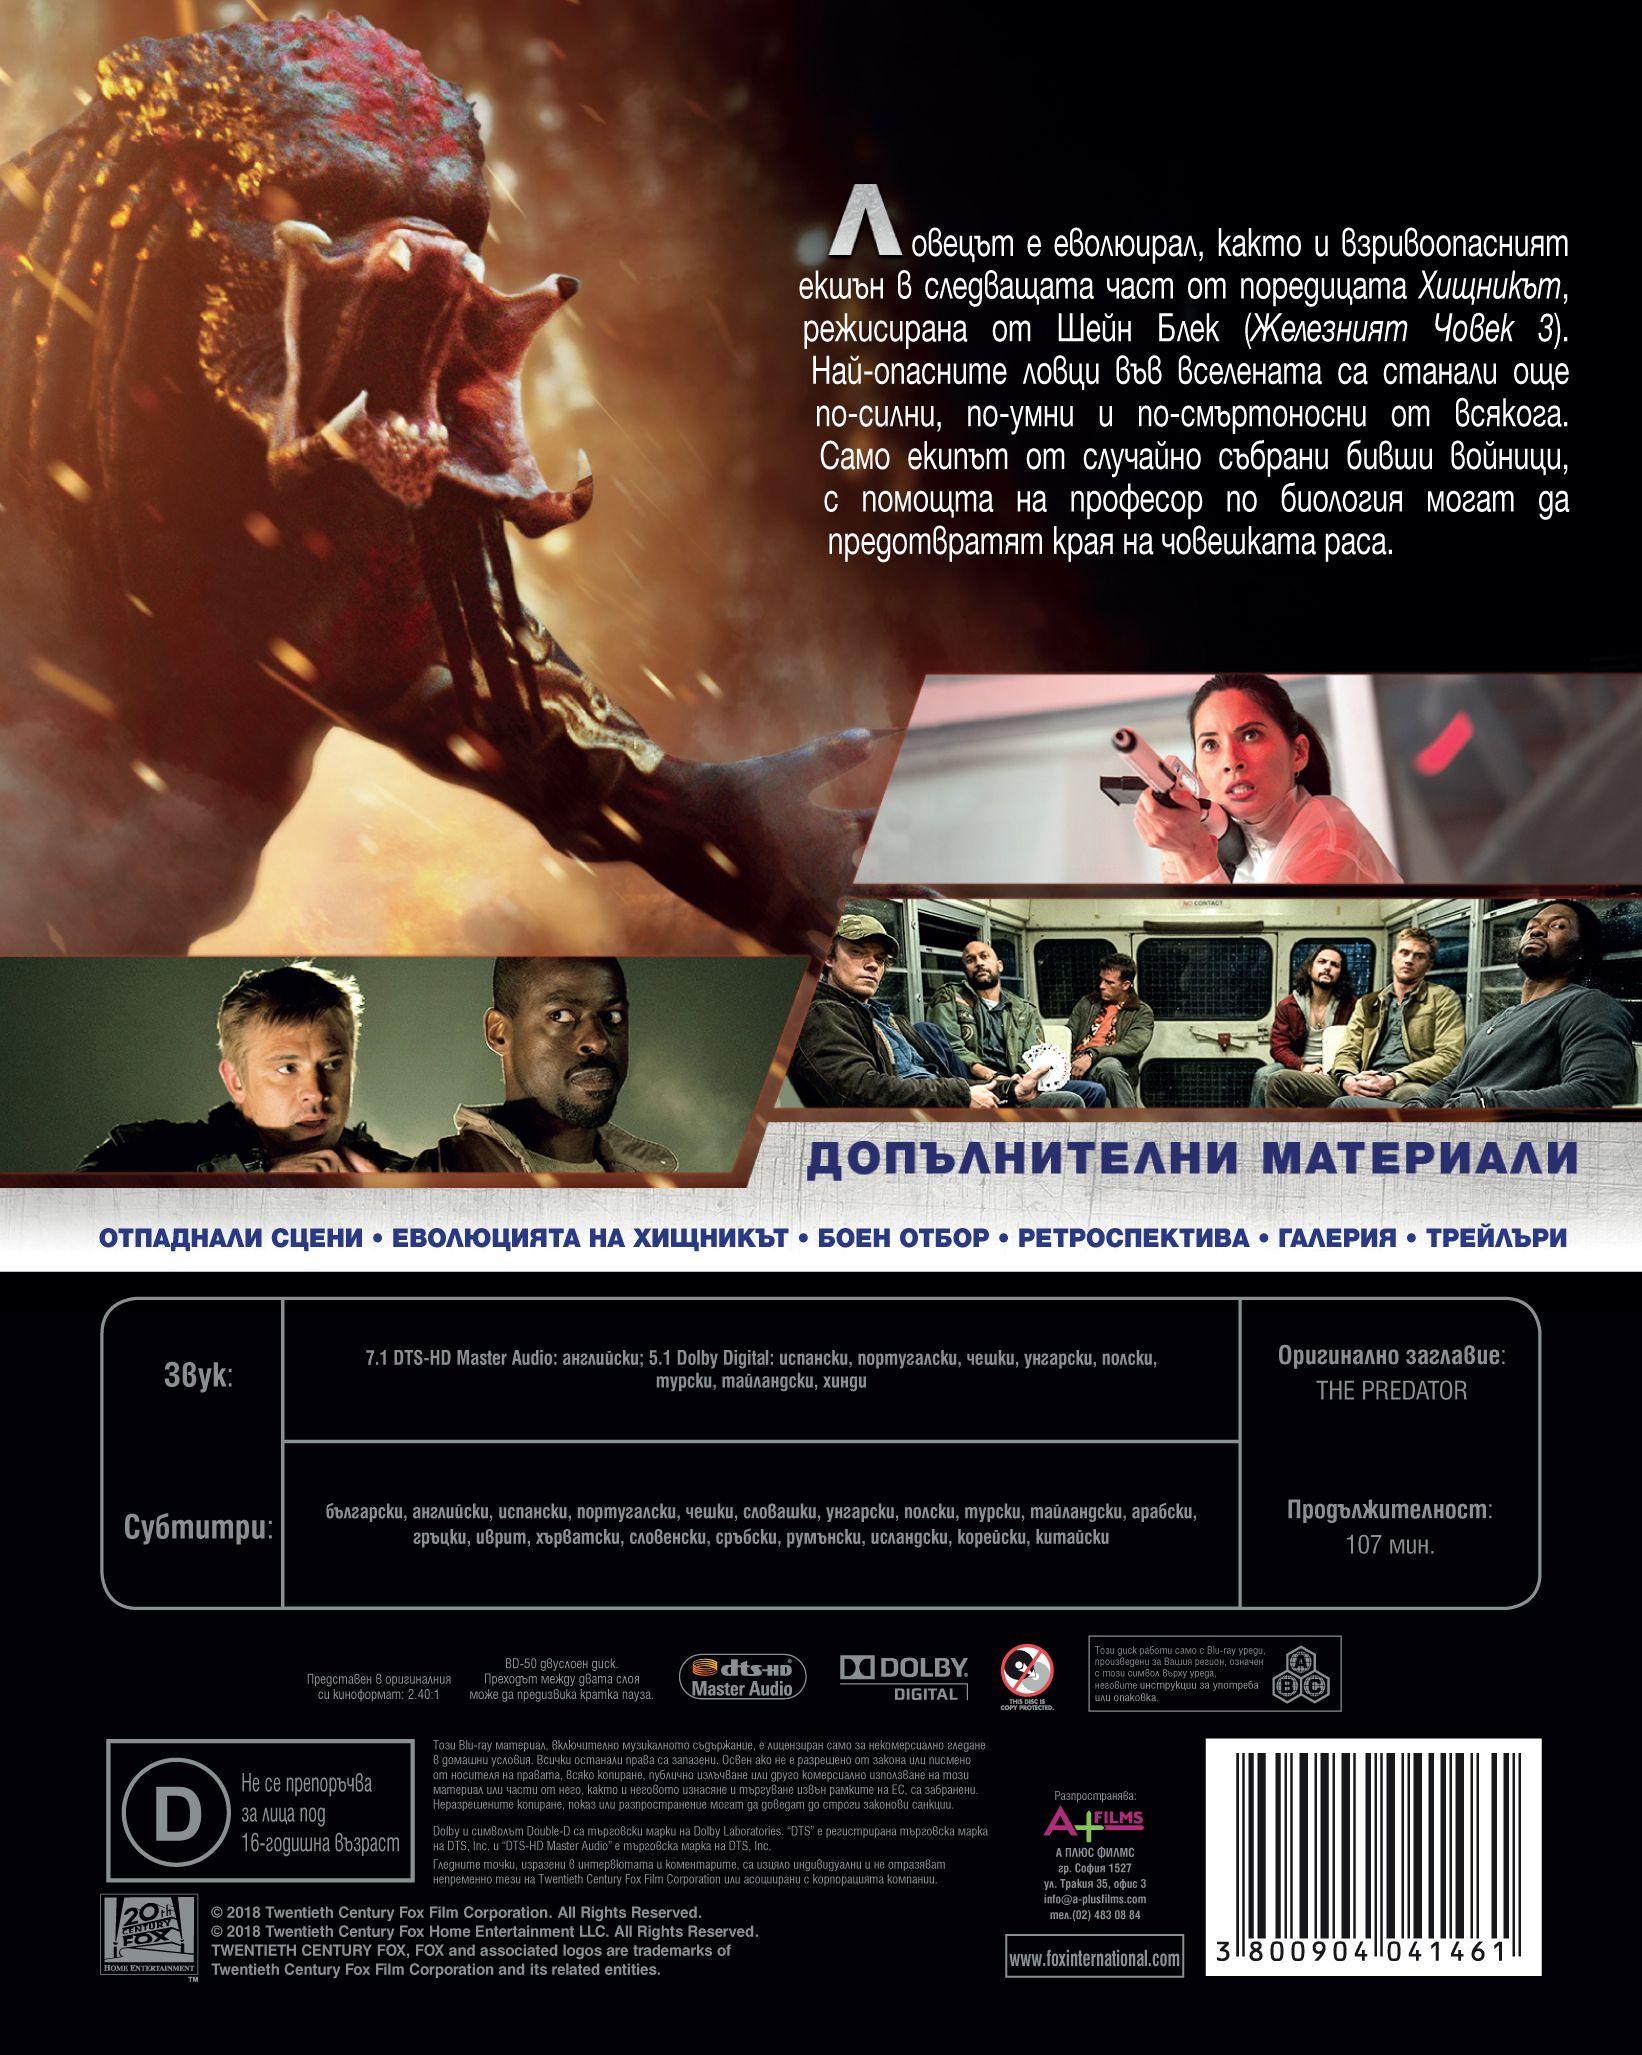 Хищникът 2018 Steelbook (Blu-ray) - 3